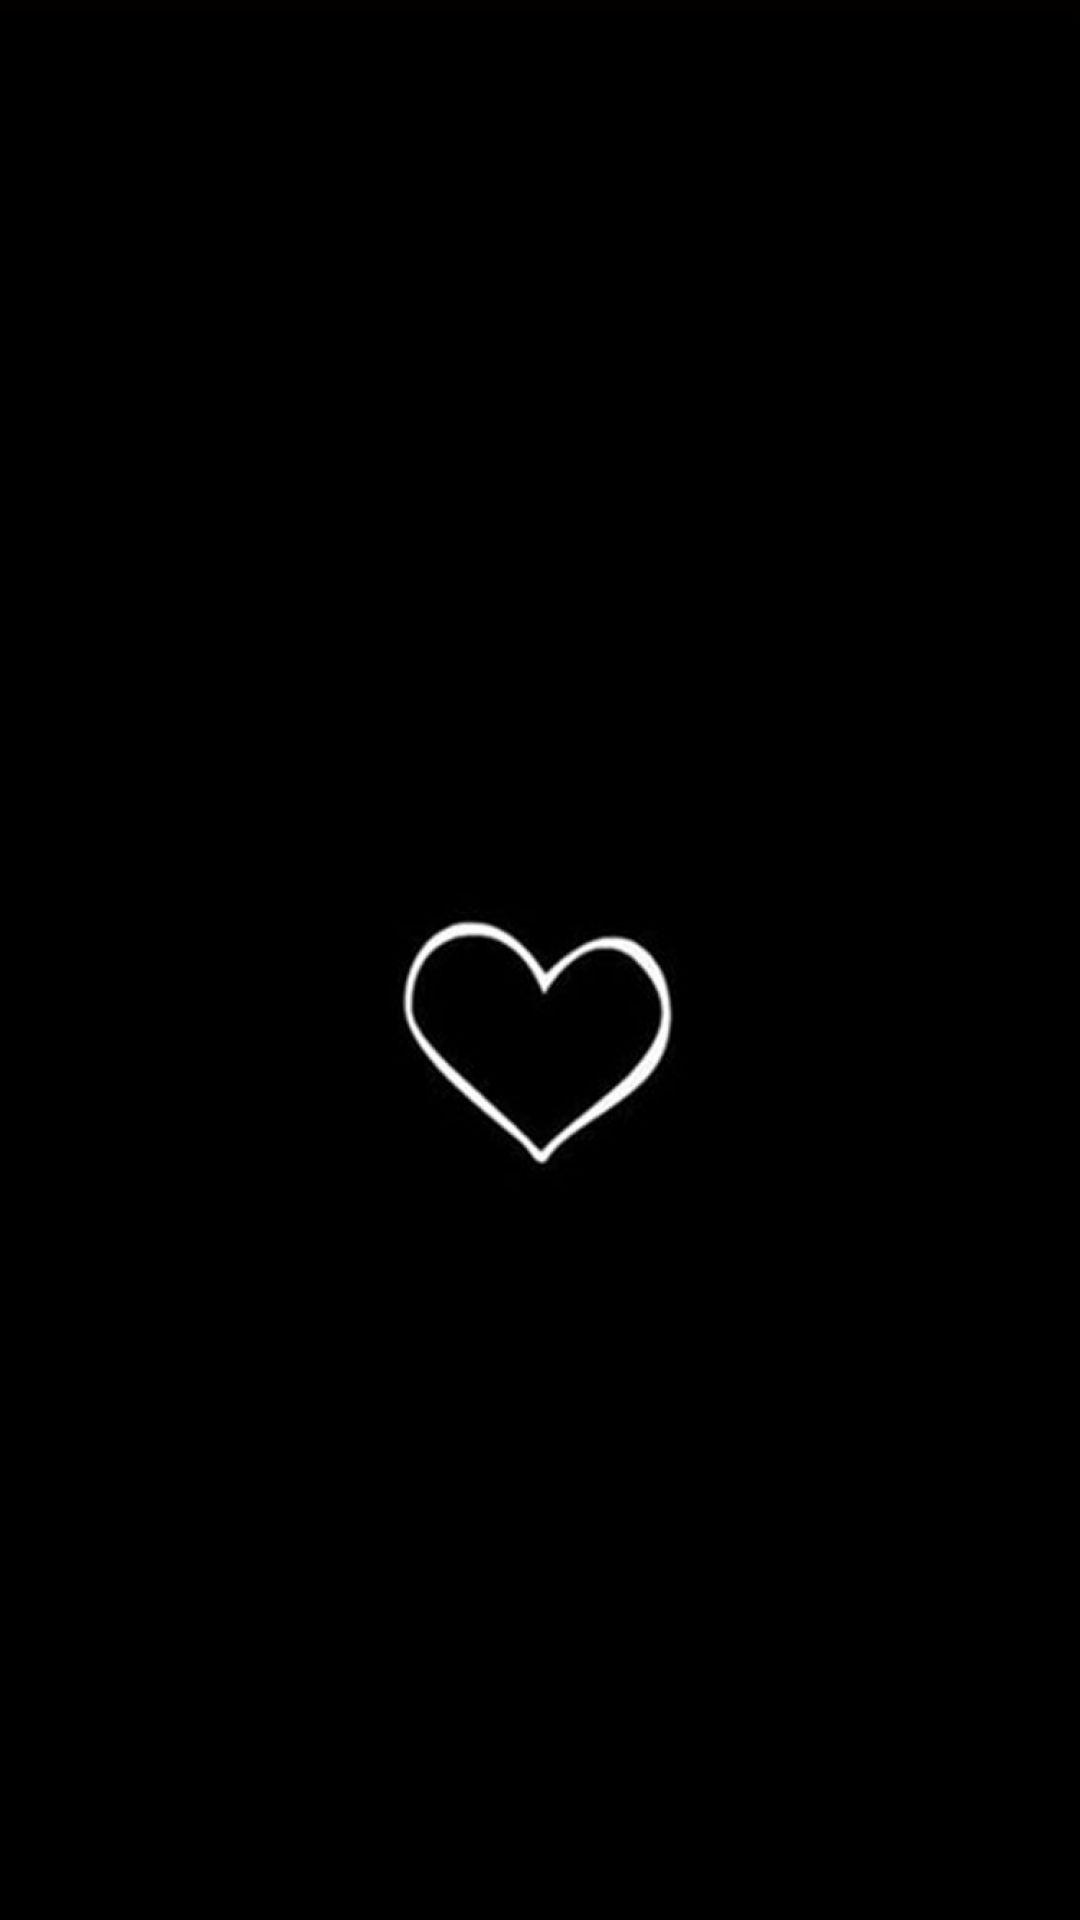 Black おしゃれまとめの人気アイデア Pinterest Lil Blue 白い壁紙 ハートの壁紙 黒の壁紙